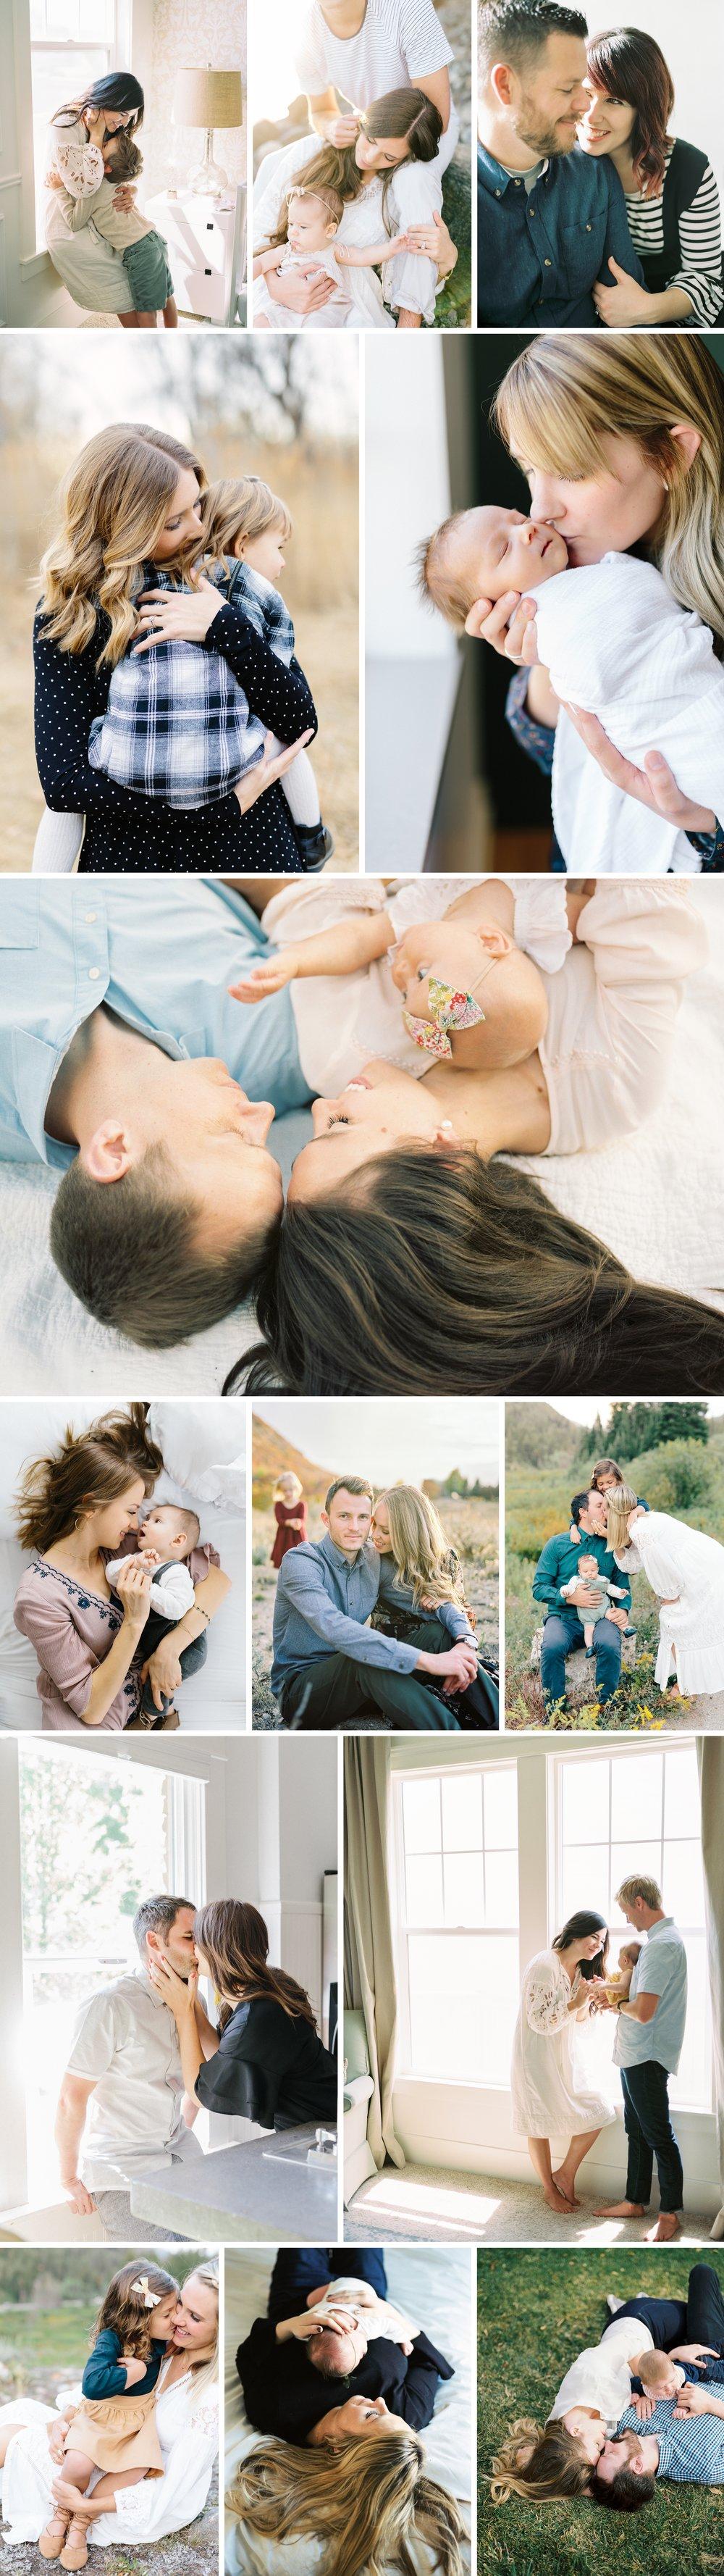 raeganchristensenphotographyfamily1